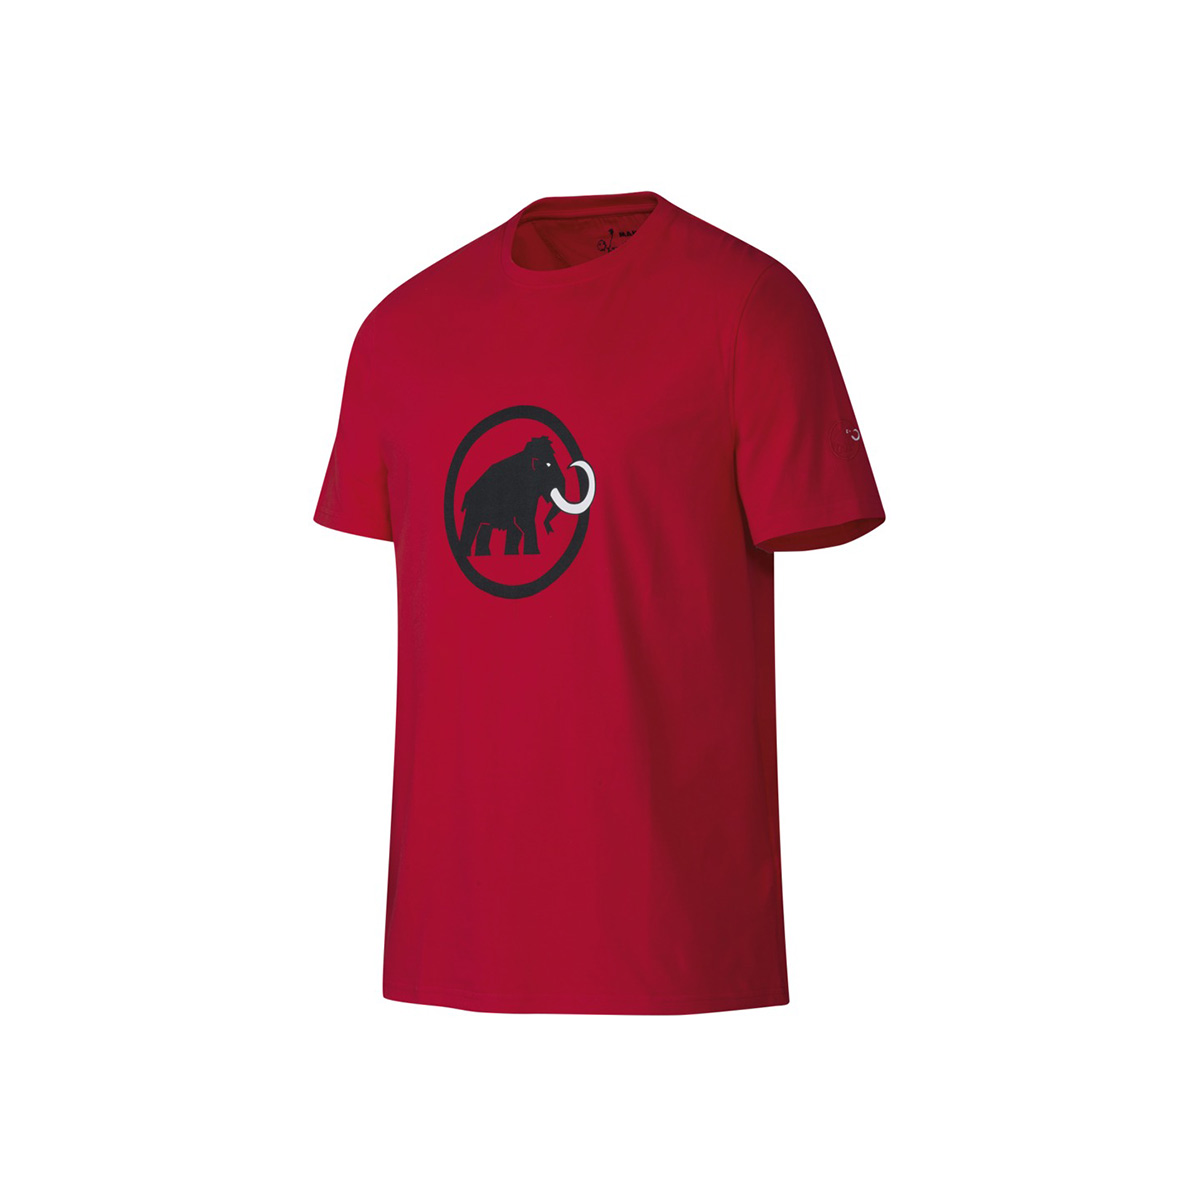 mammut logo t shirt t shirts shirts tops epictv shop. Black Bedroom Furniture Sets. Home Design Ideas